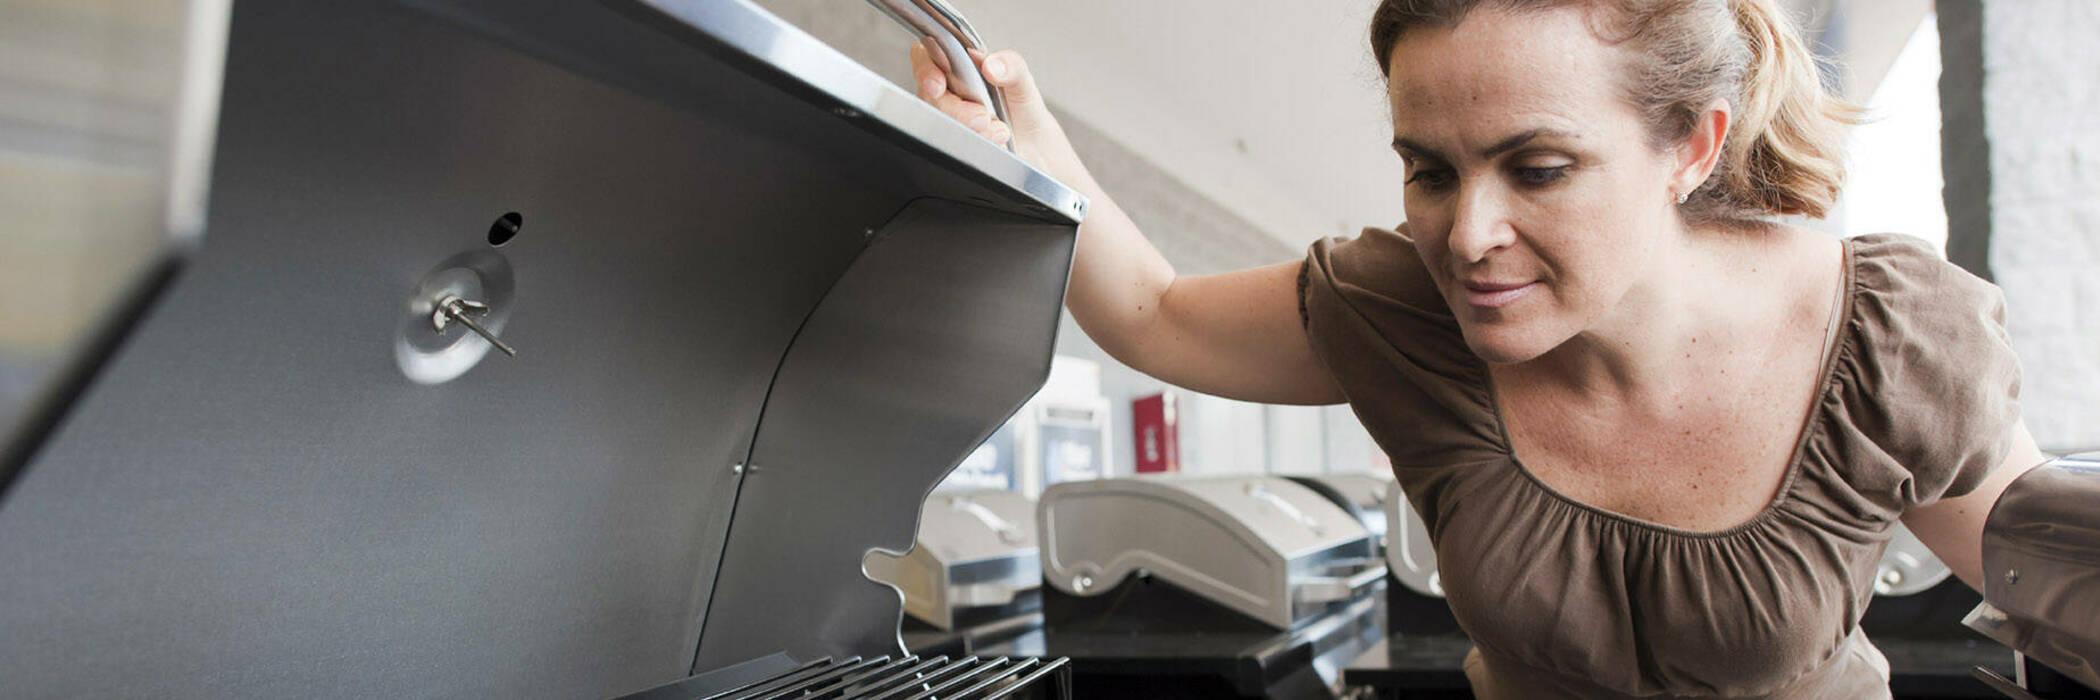 15dec barbecue buying tips hero